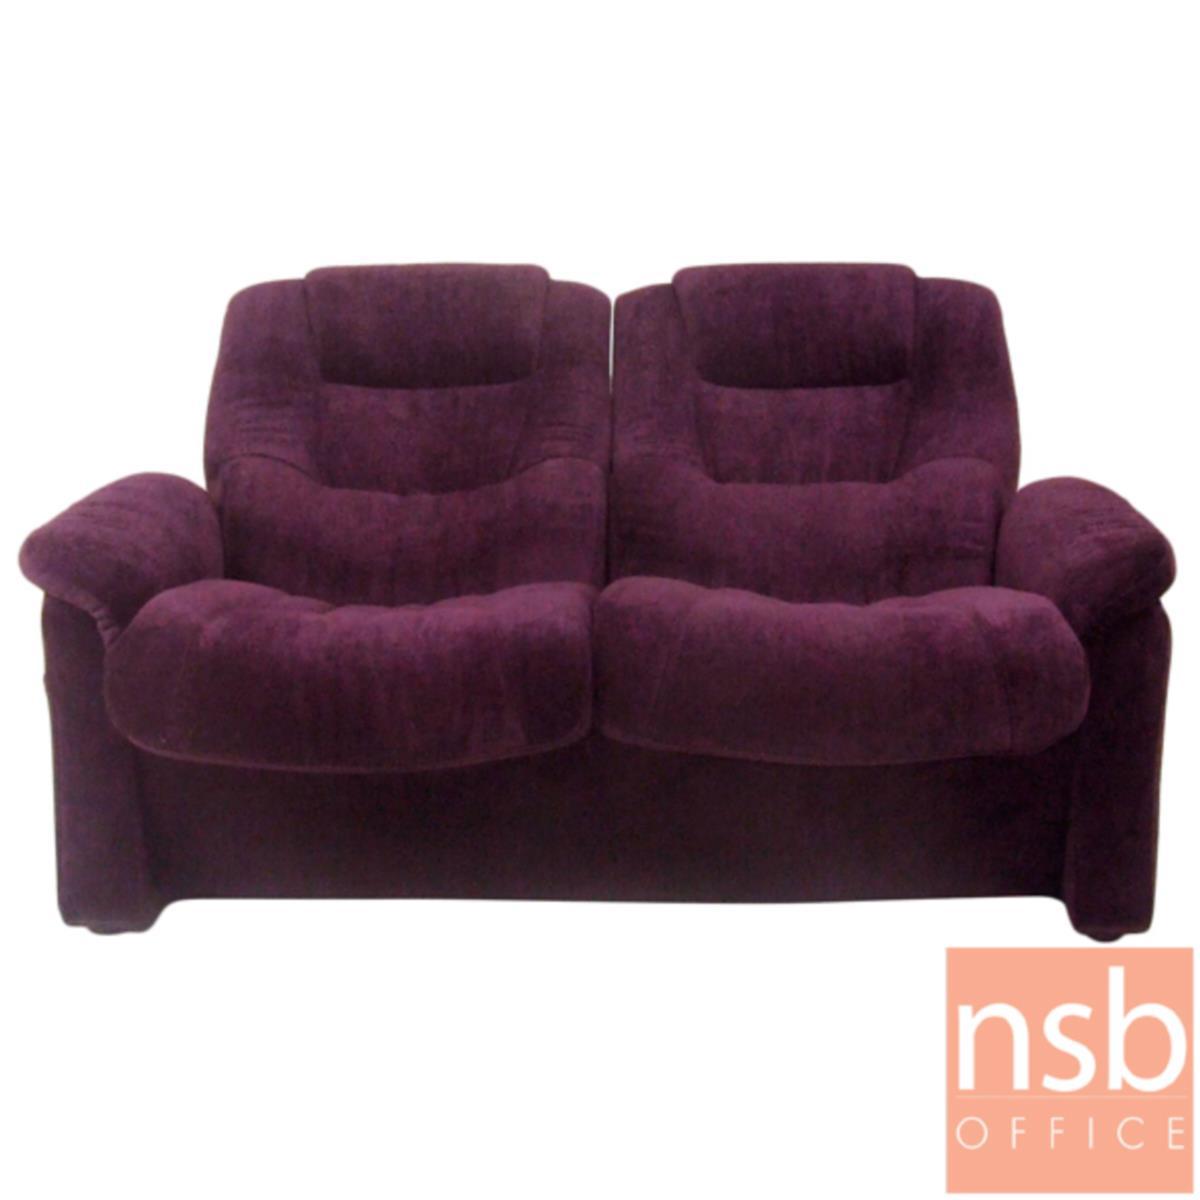 B12A276:เก้าอี้โซฟาโรงหนัง รุ่น MN-SNY  ขนาด 83W ,140W cm.  ปรับเอนได้